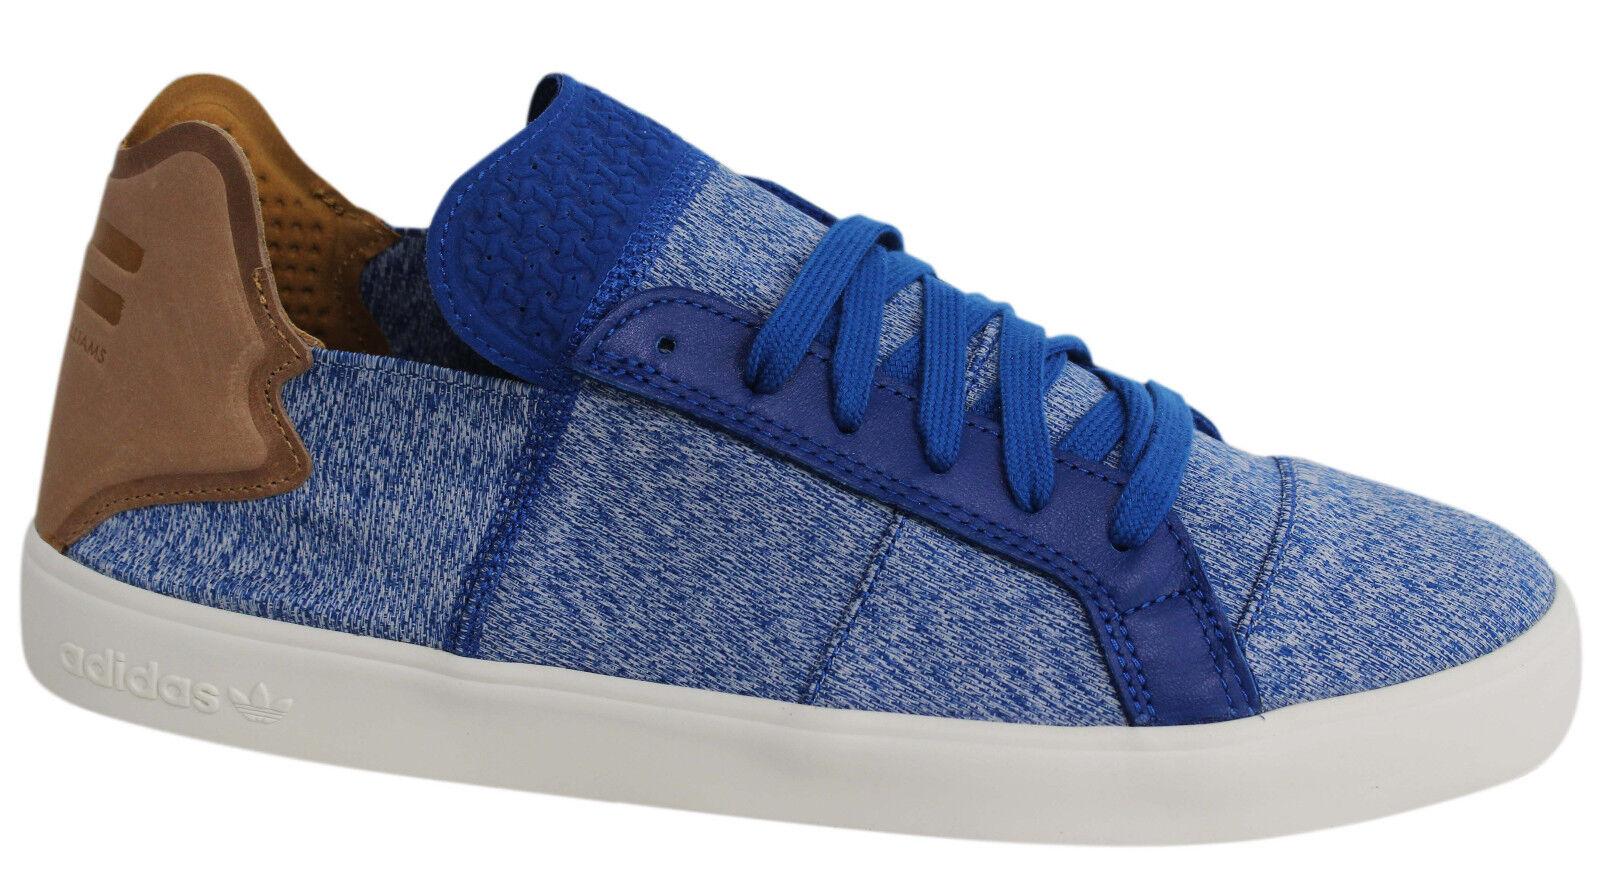 Adidas Originals Lace Up Pharrell AQ5779 Williams bleu Hommes Trainers AQ5779 Pharrell U13 f63fa7